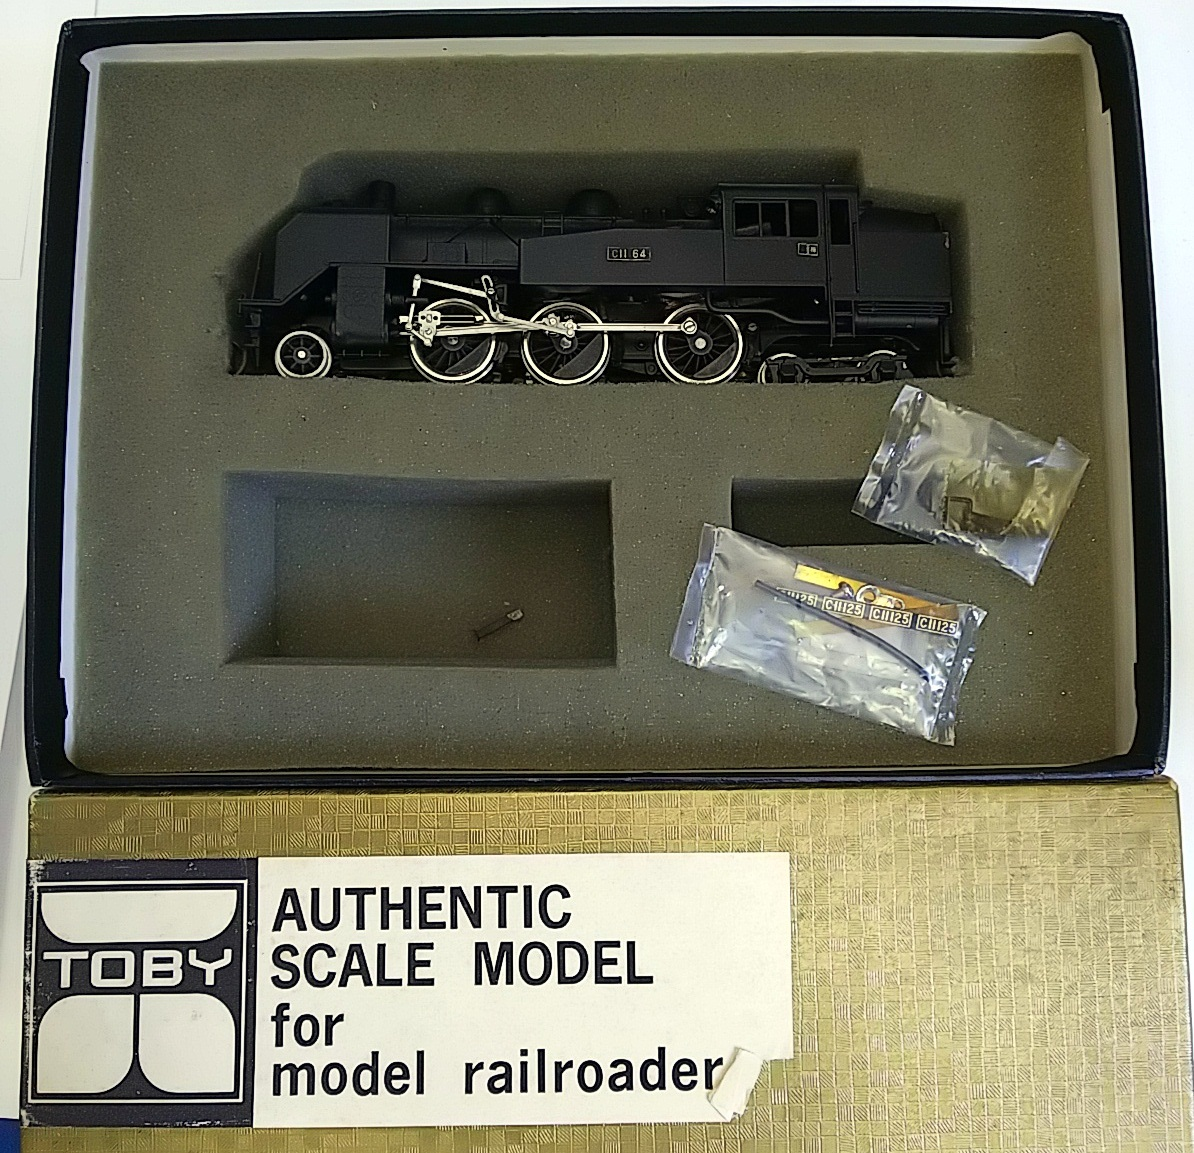 TOBY トビー模型 国鉄 C11形 蒸気機関車 HOゲージ 非可動品_画像6